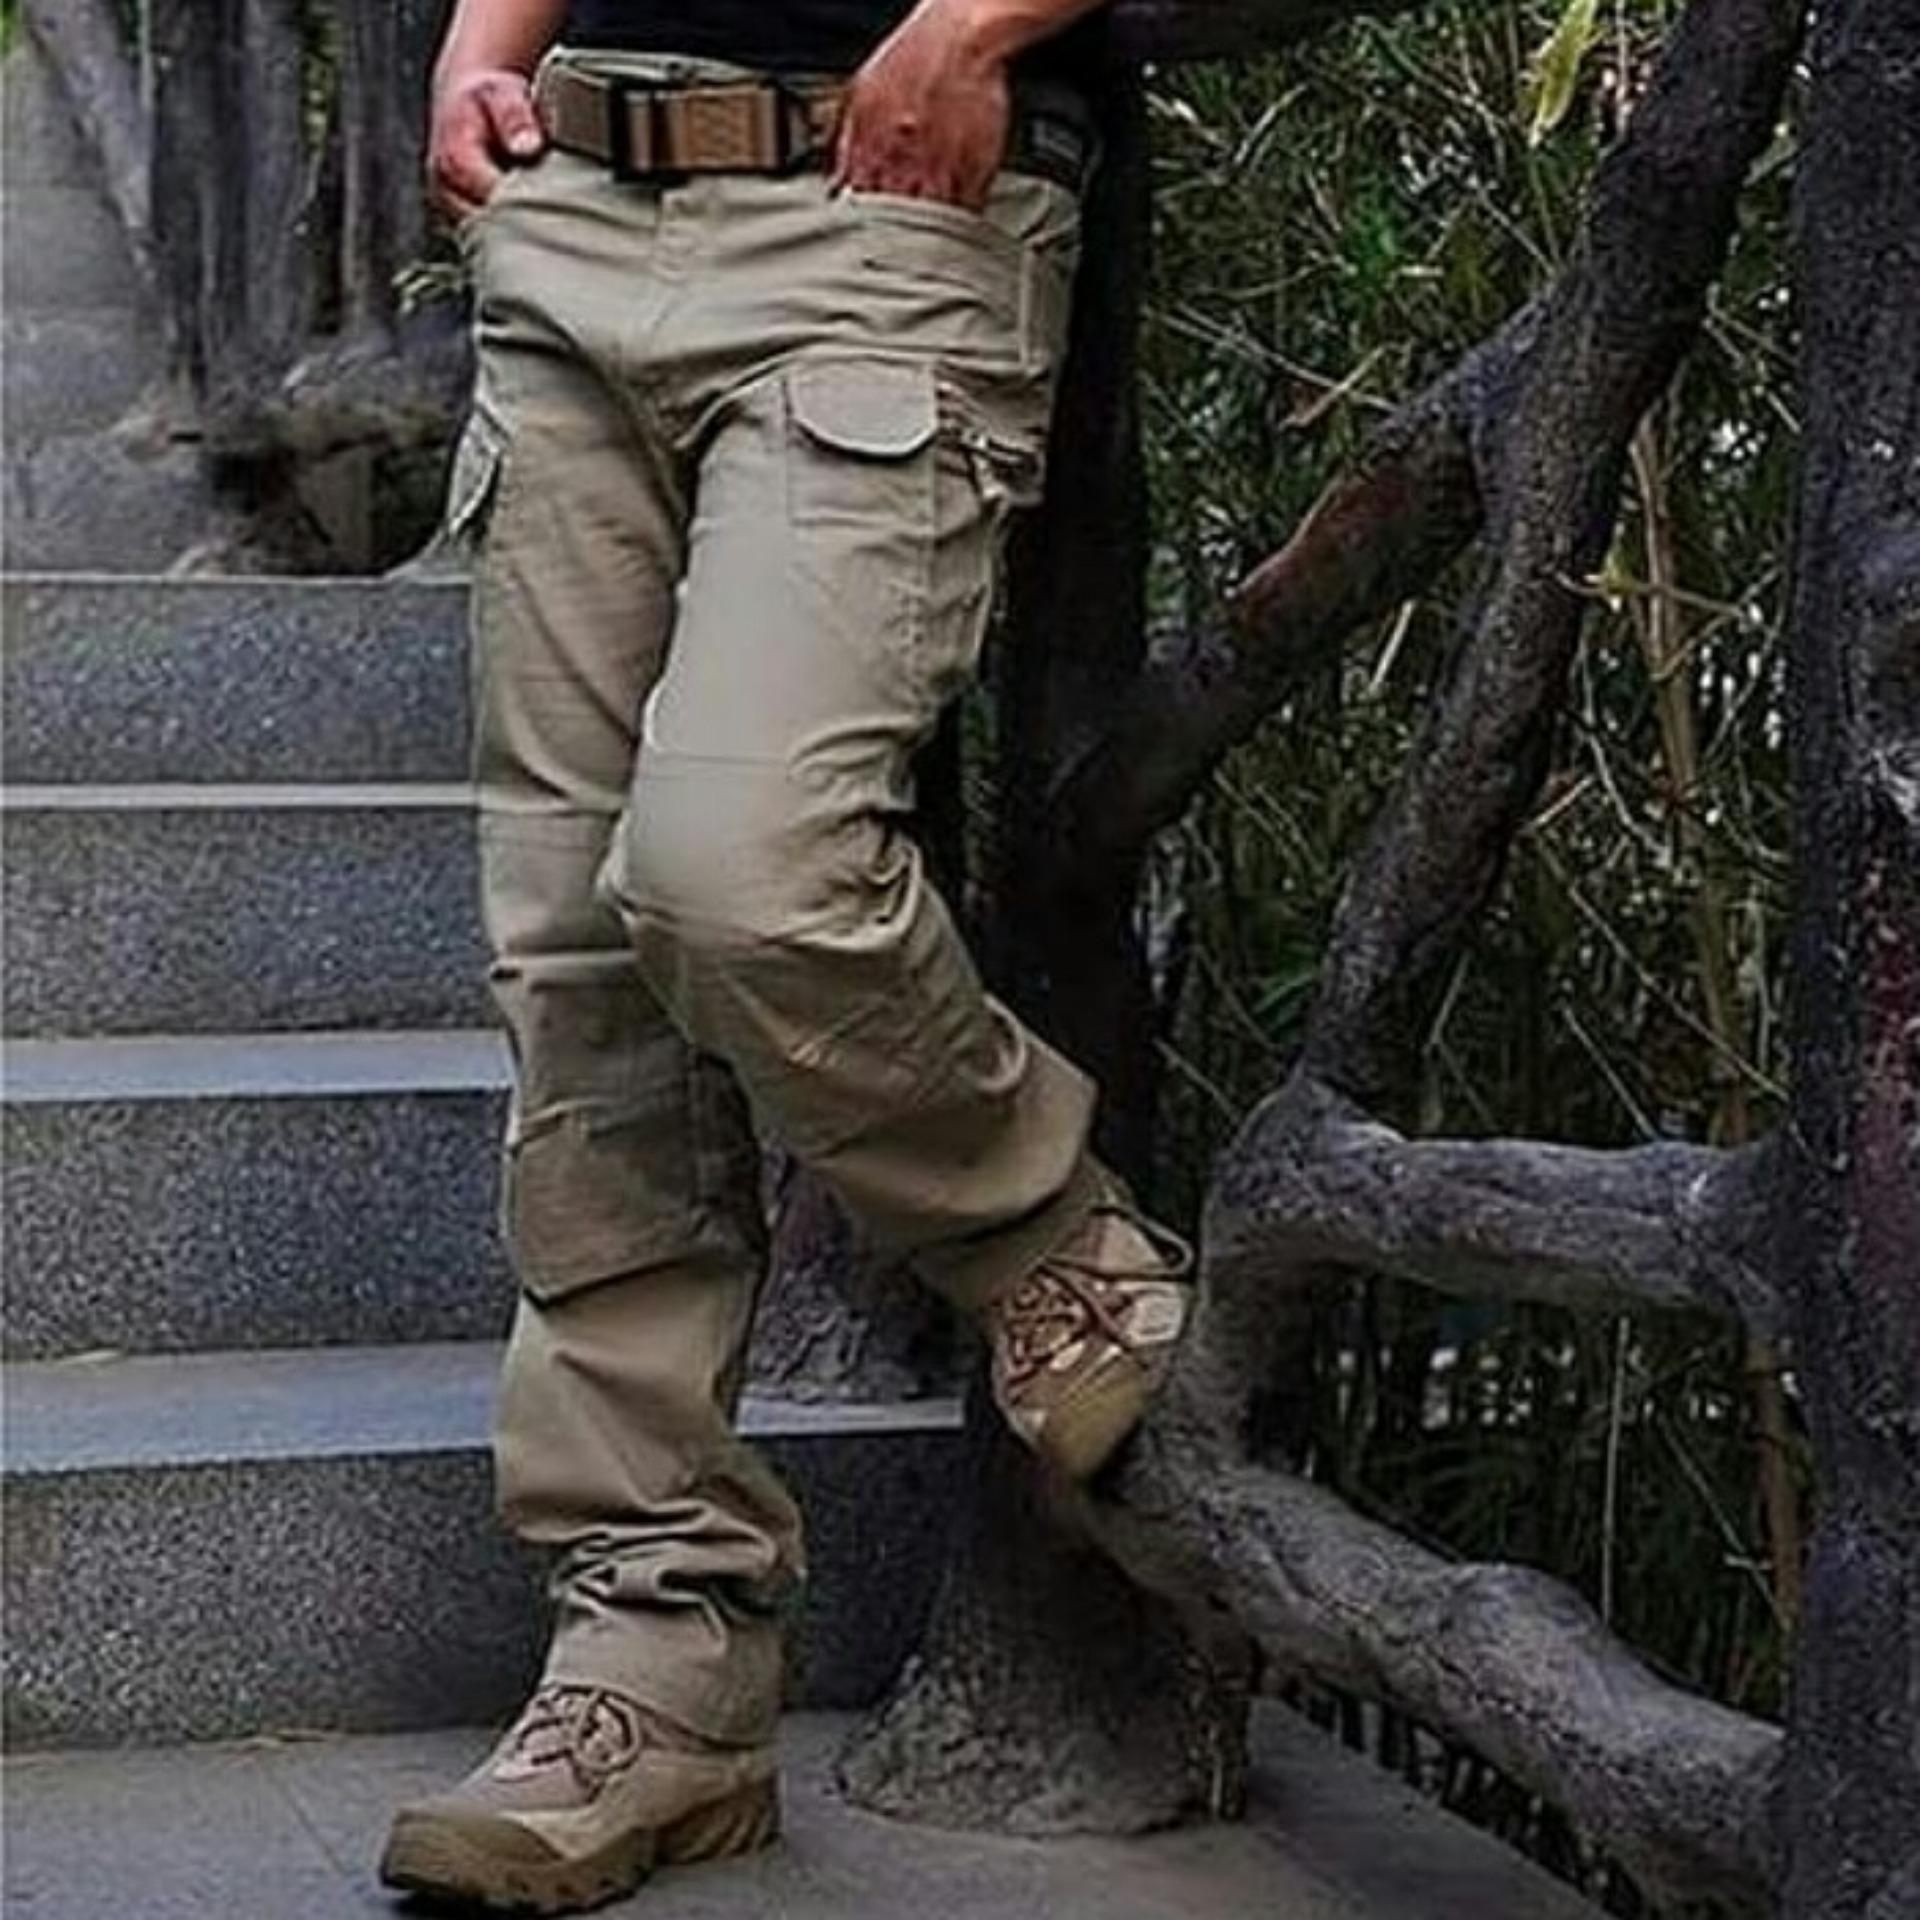 Murah Celana Panjang Kargo Warna Krem Model Blackhawk Tactical Source · CELANA TACTICAL BLACKHAWK CELANA TACTICAL BLACKHAWK